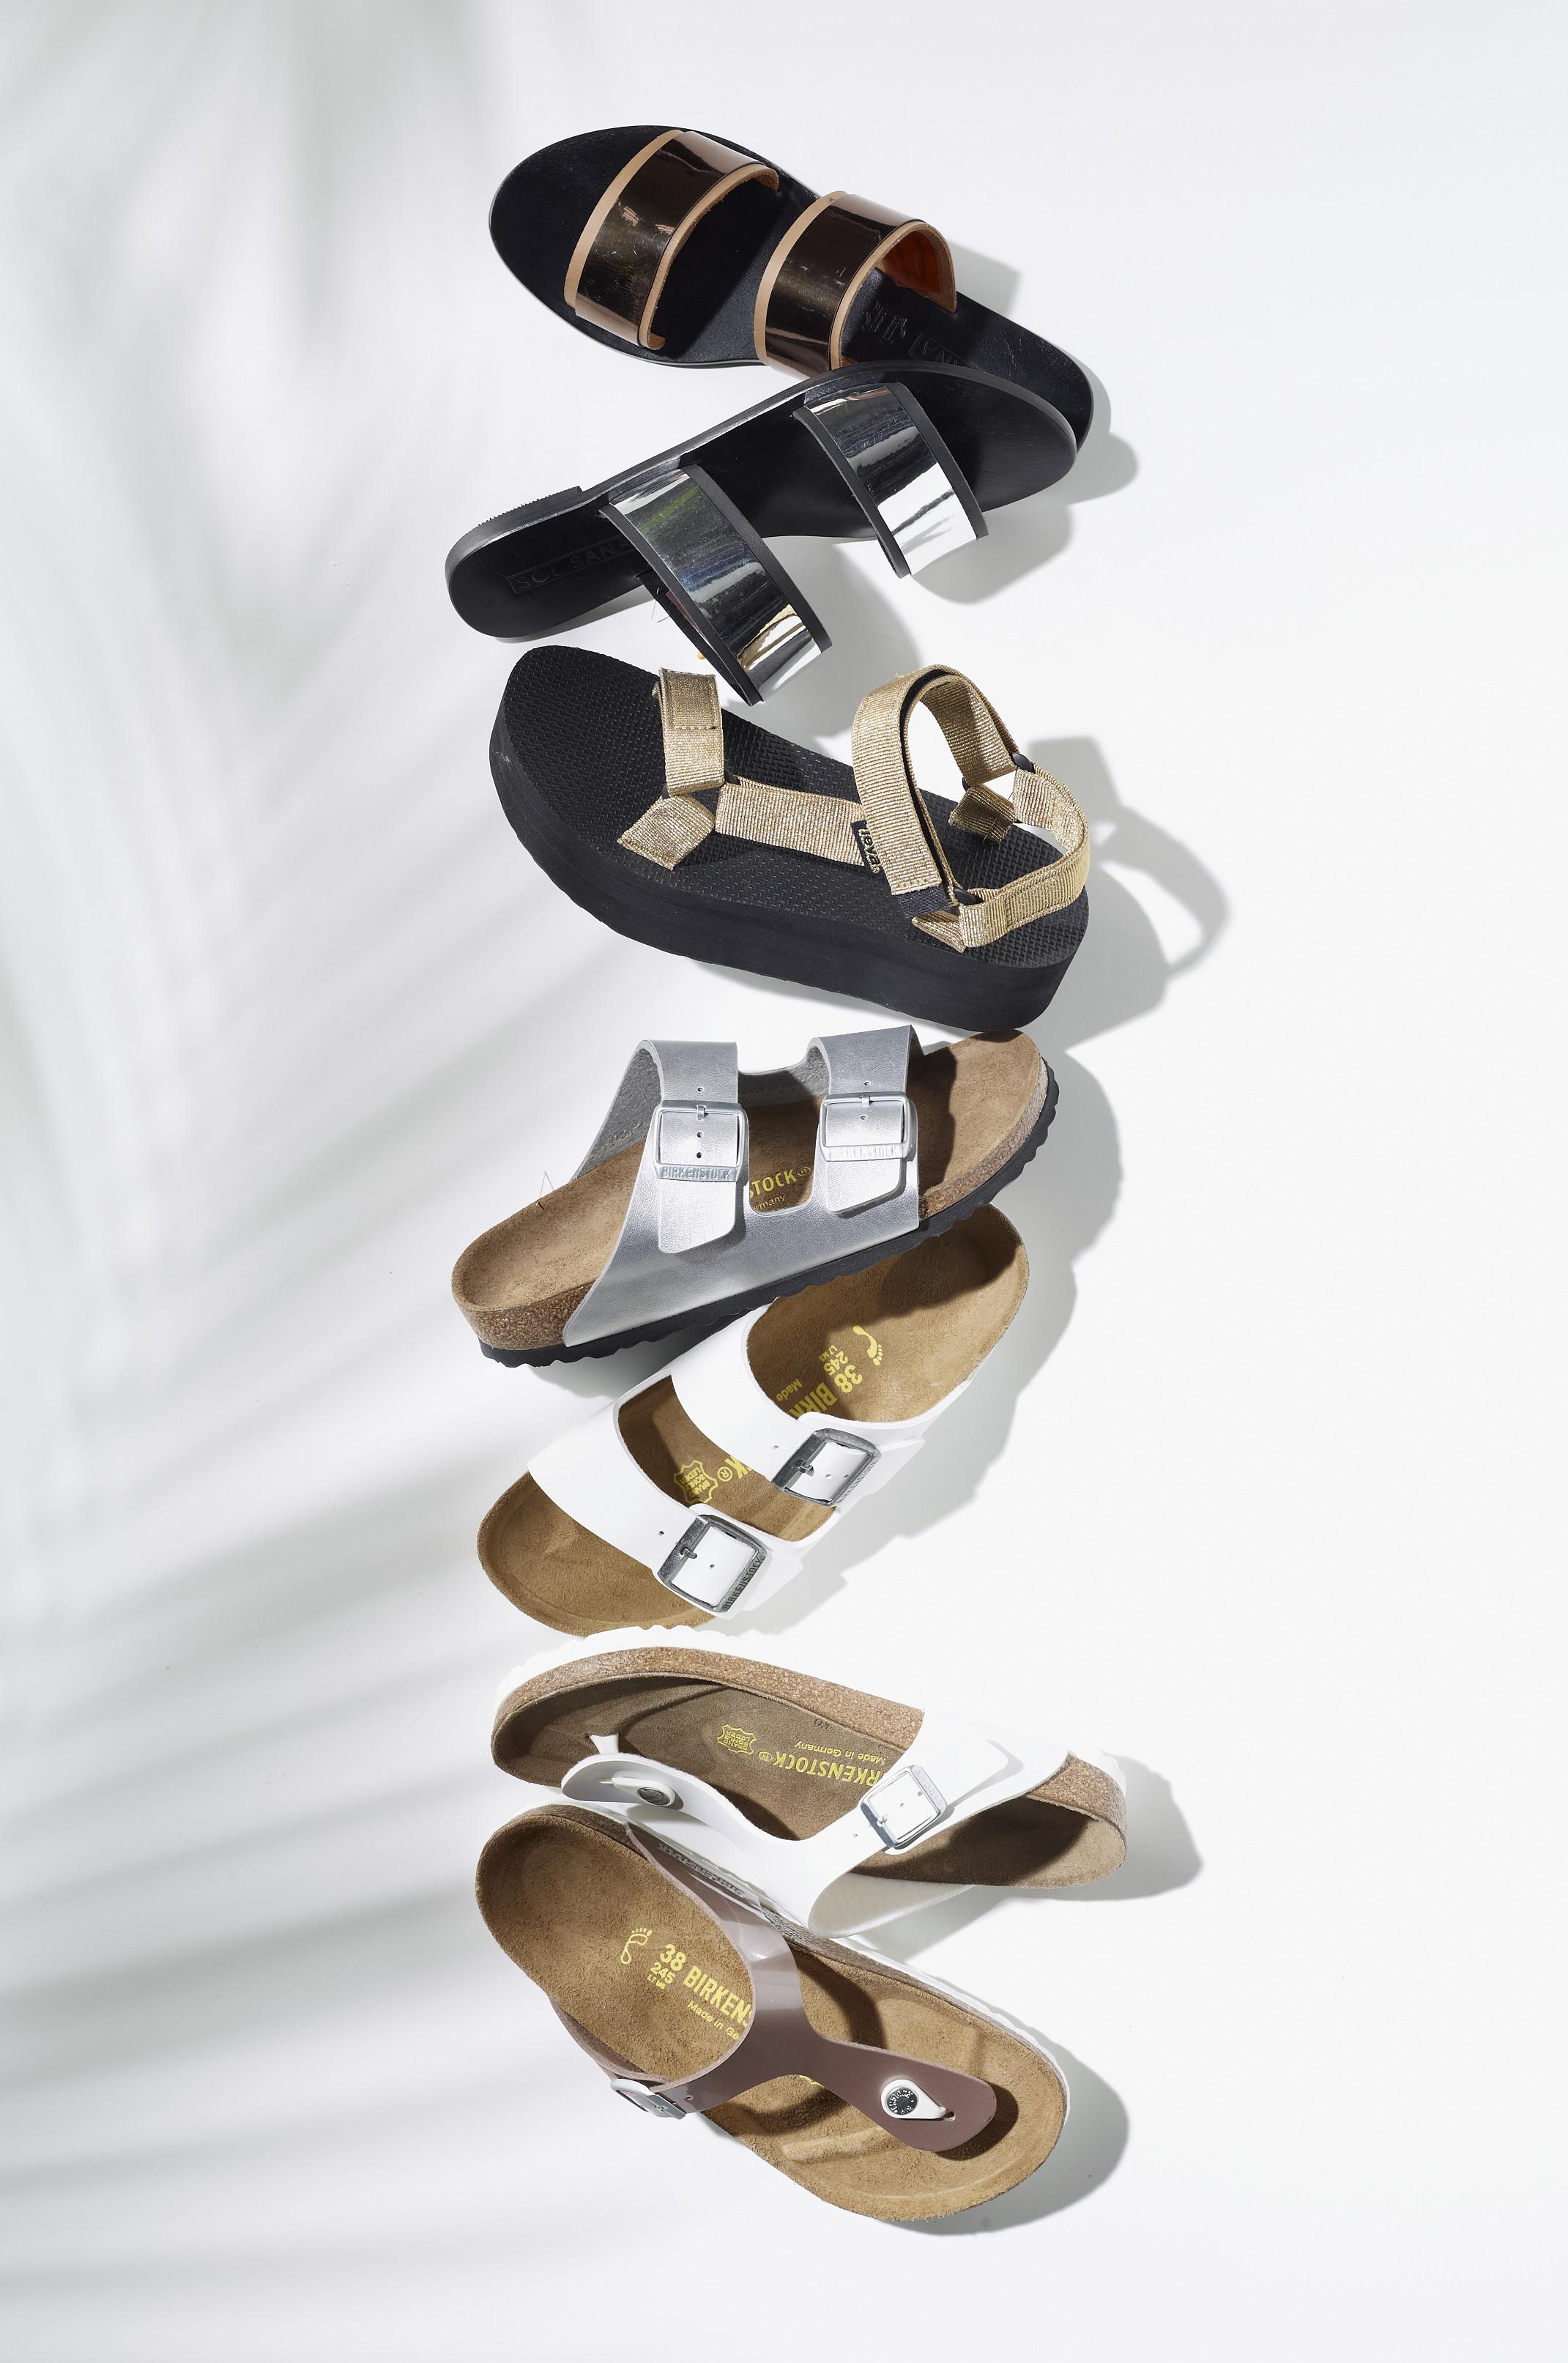 sandles.jpg